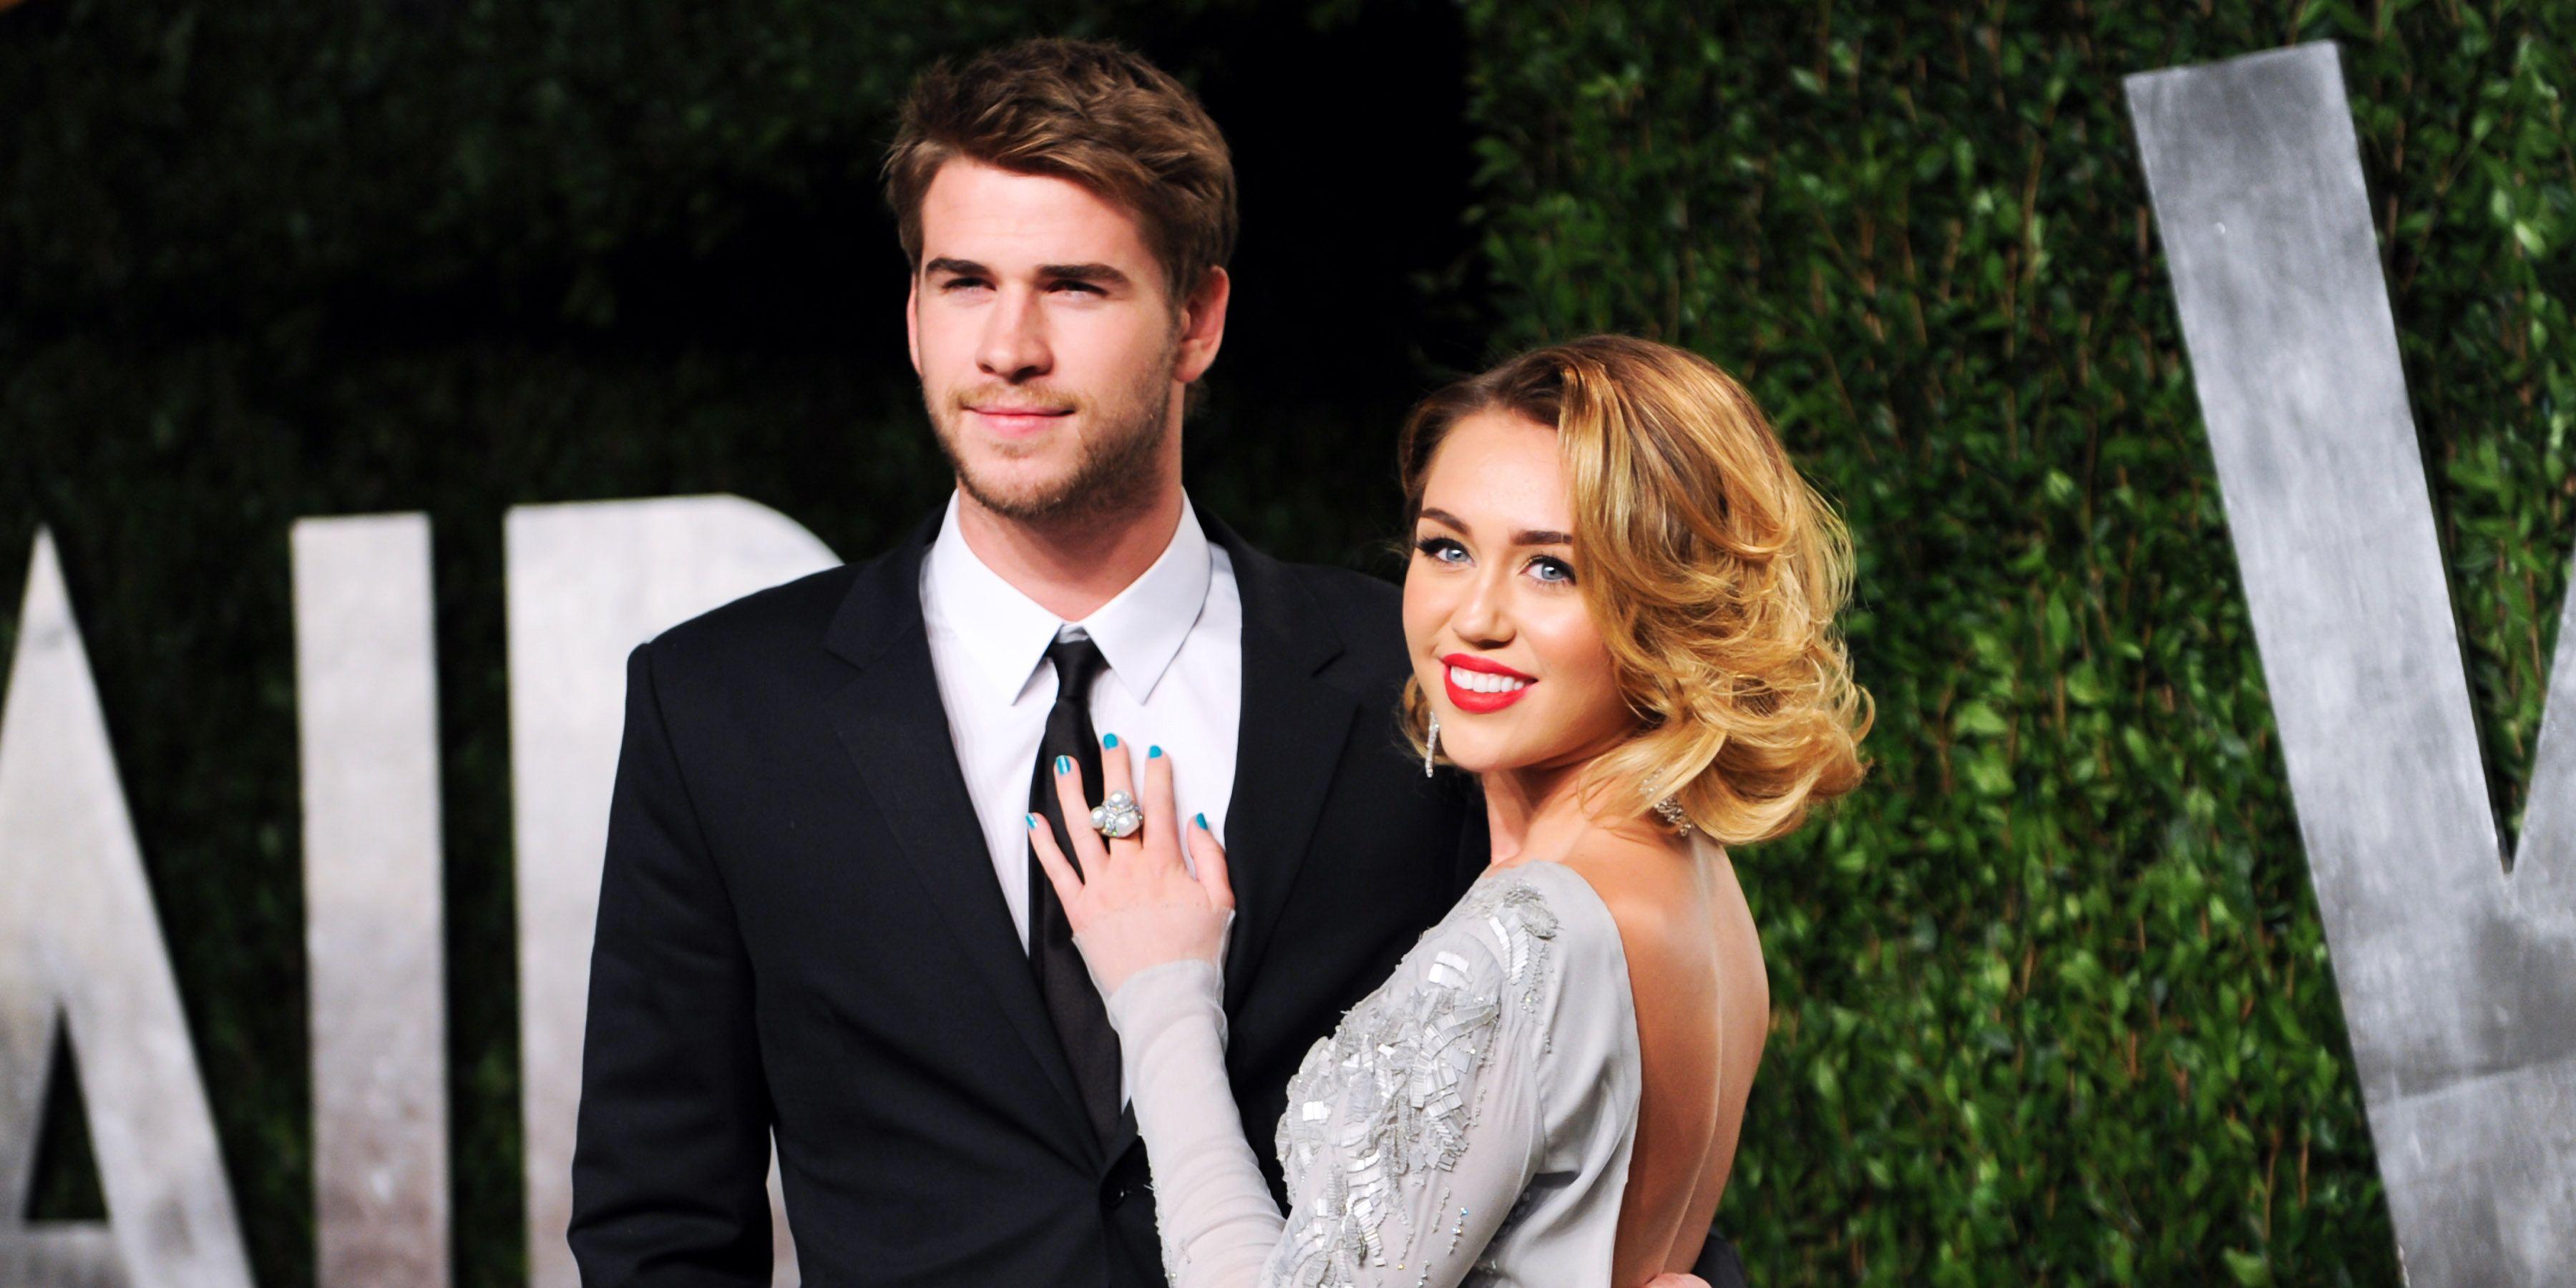 84th Annual Academy Awards, Vanity Fair Party, Los Angeles, America - 26 Feb 2012